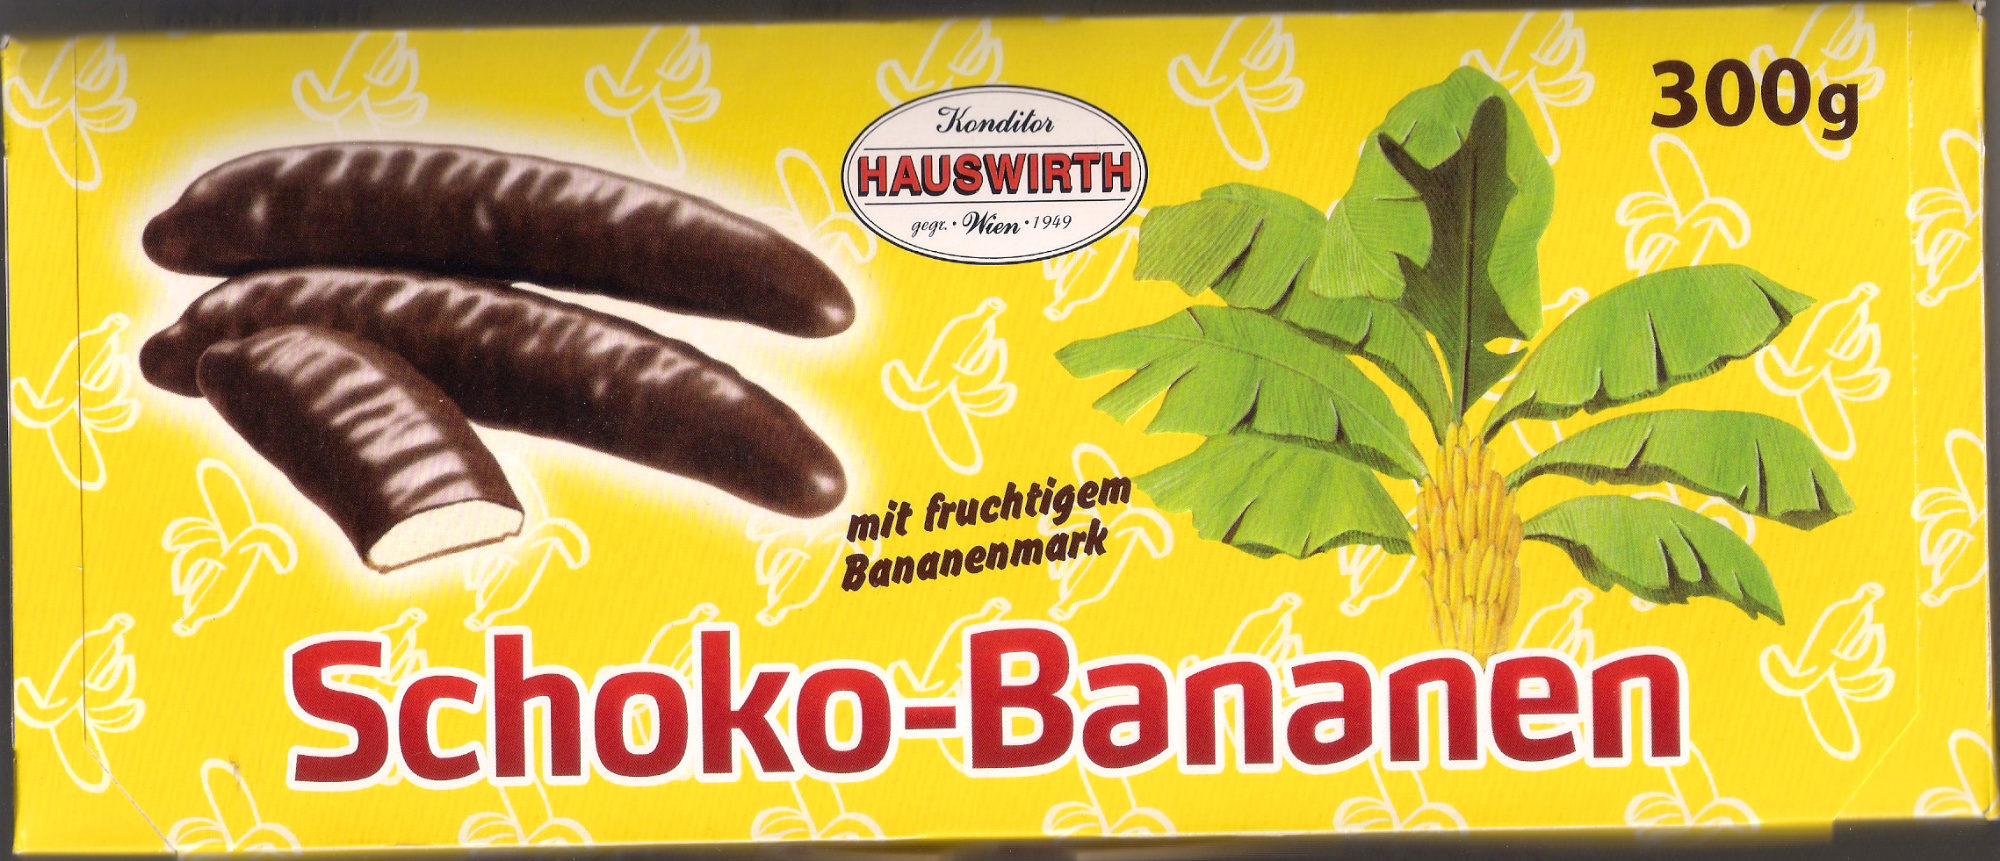 Schoko-Bananen - Produkt - de